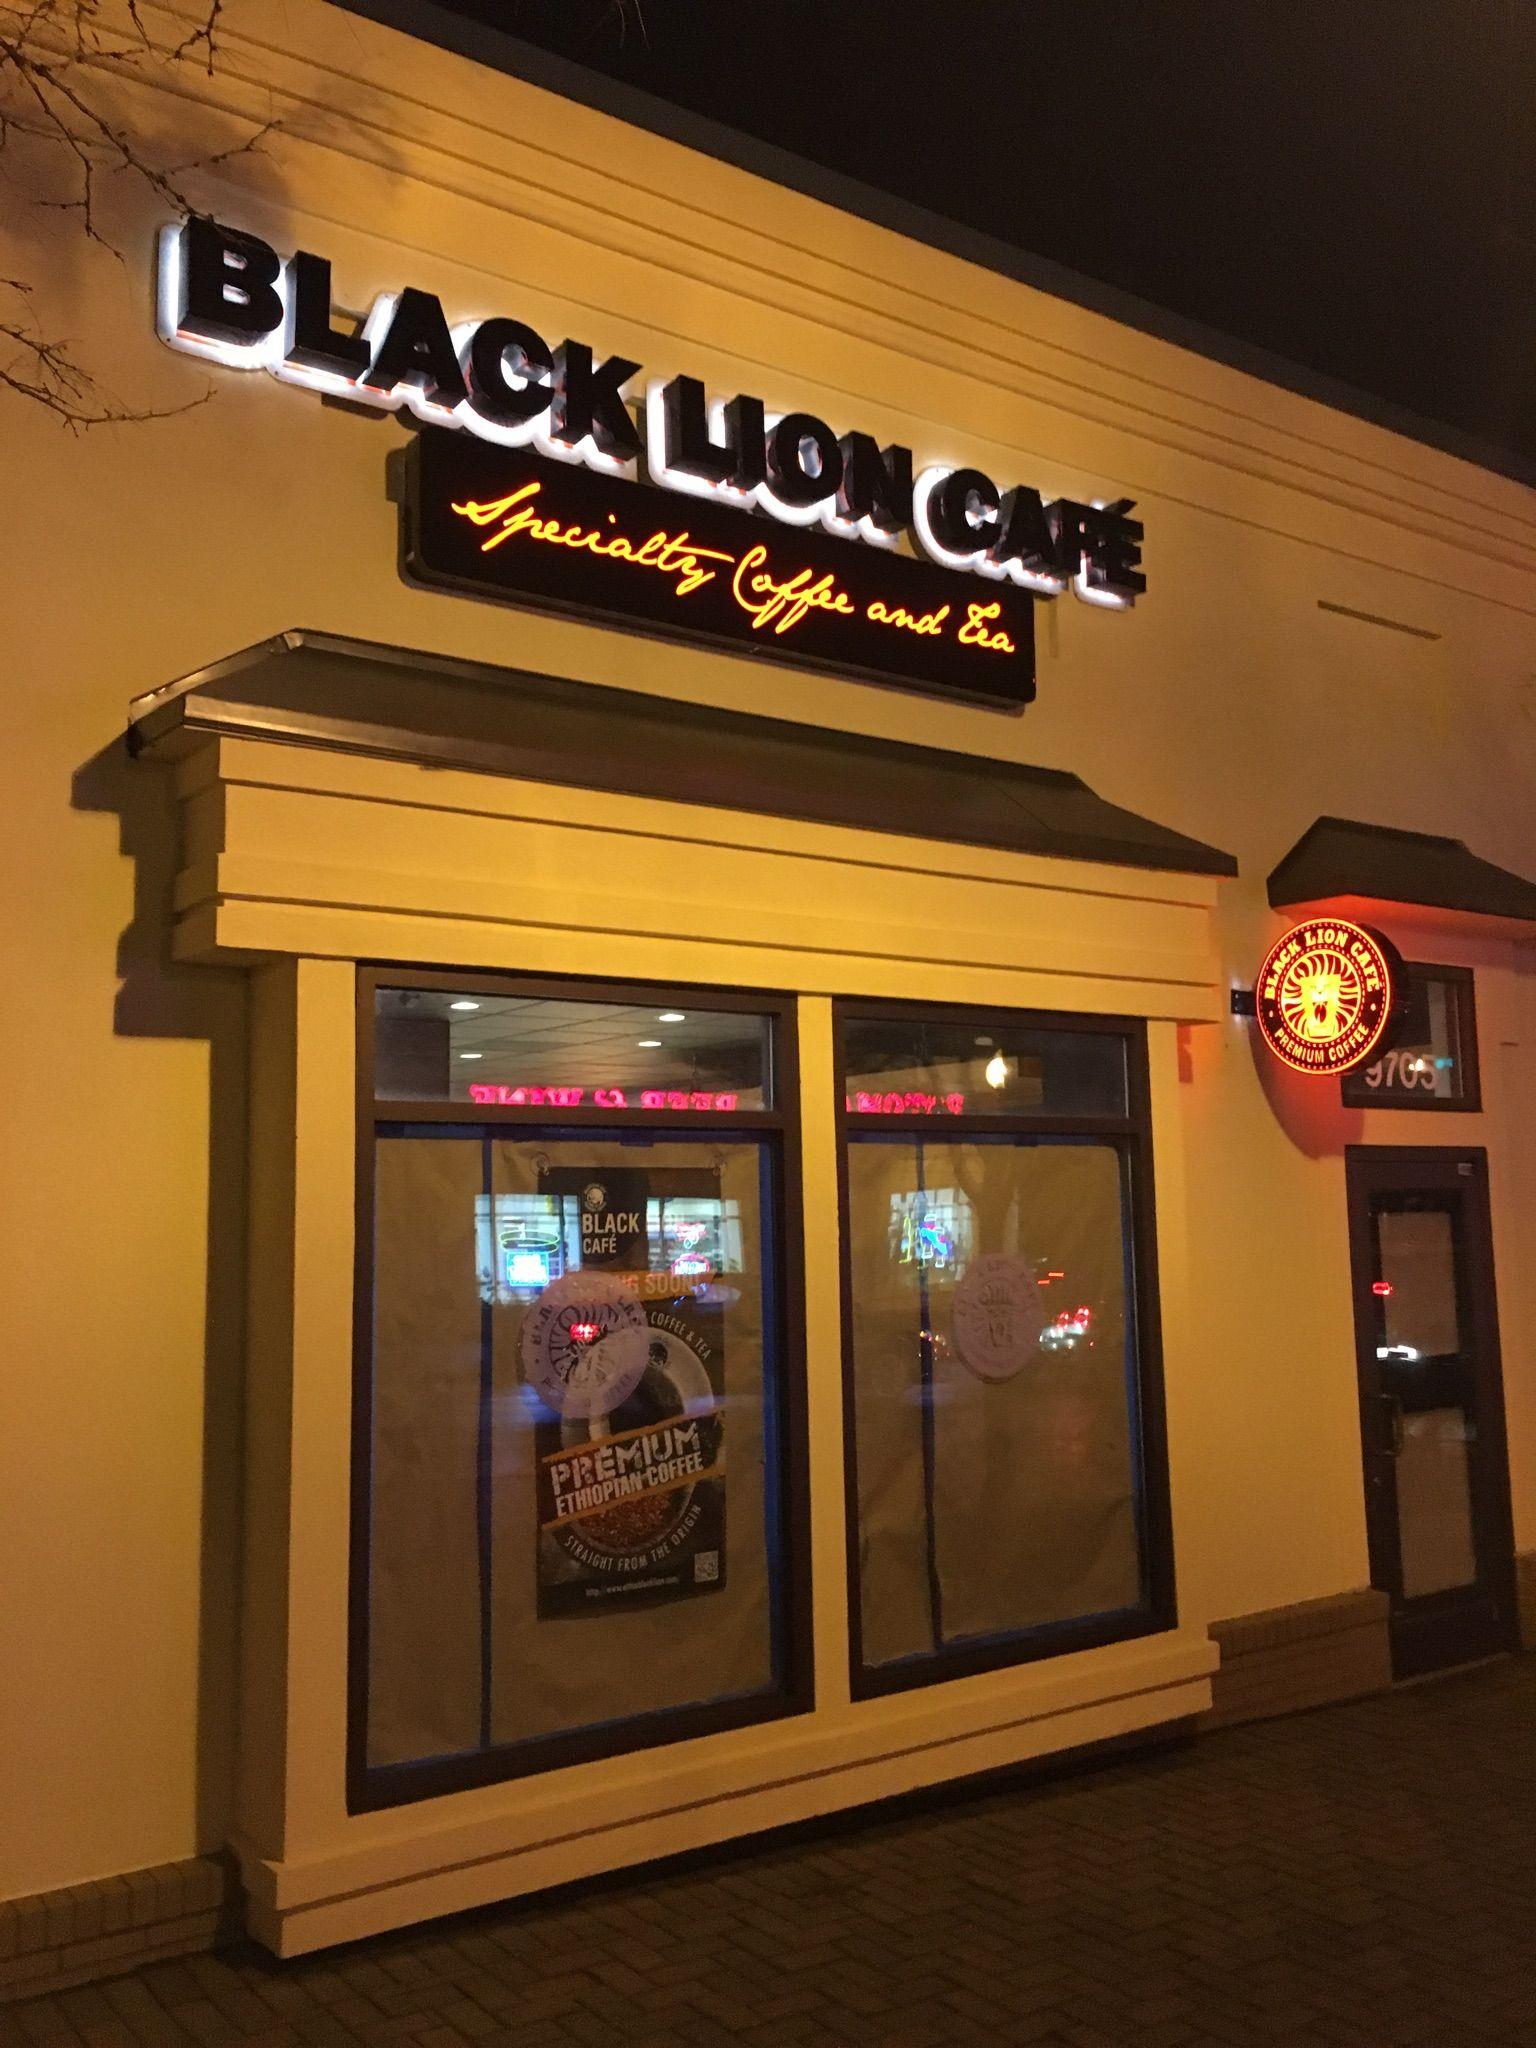 Black Lion Cafe Near Univ Shady Grove Premium Coffee Broadway Shows Shady Grove